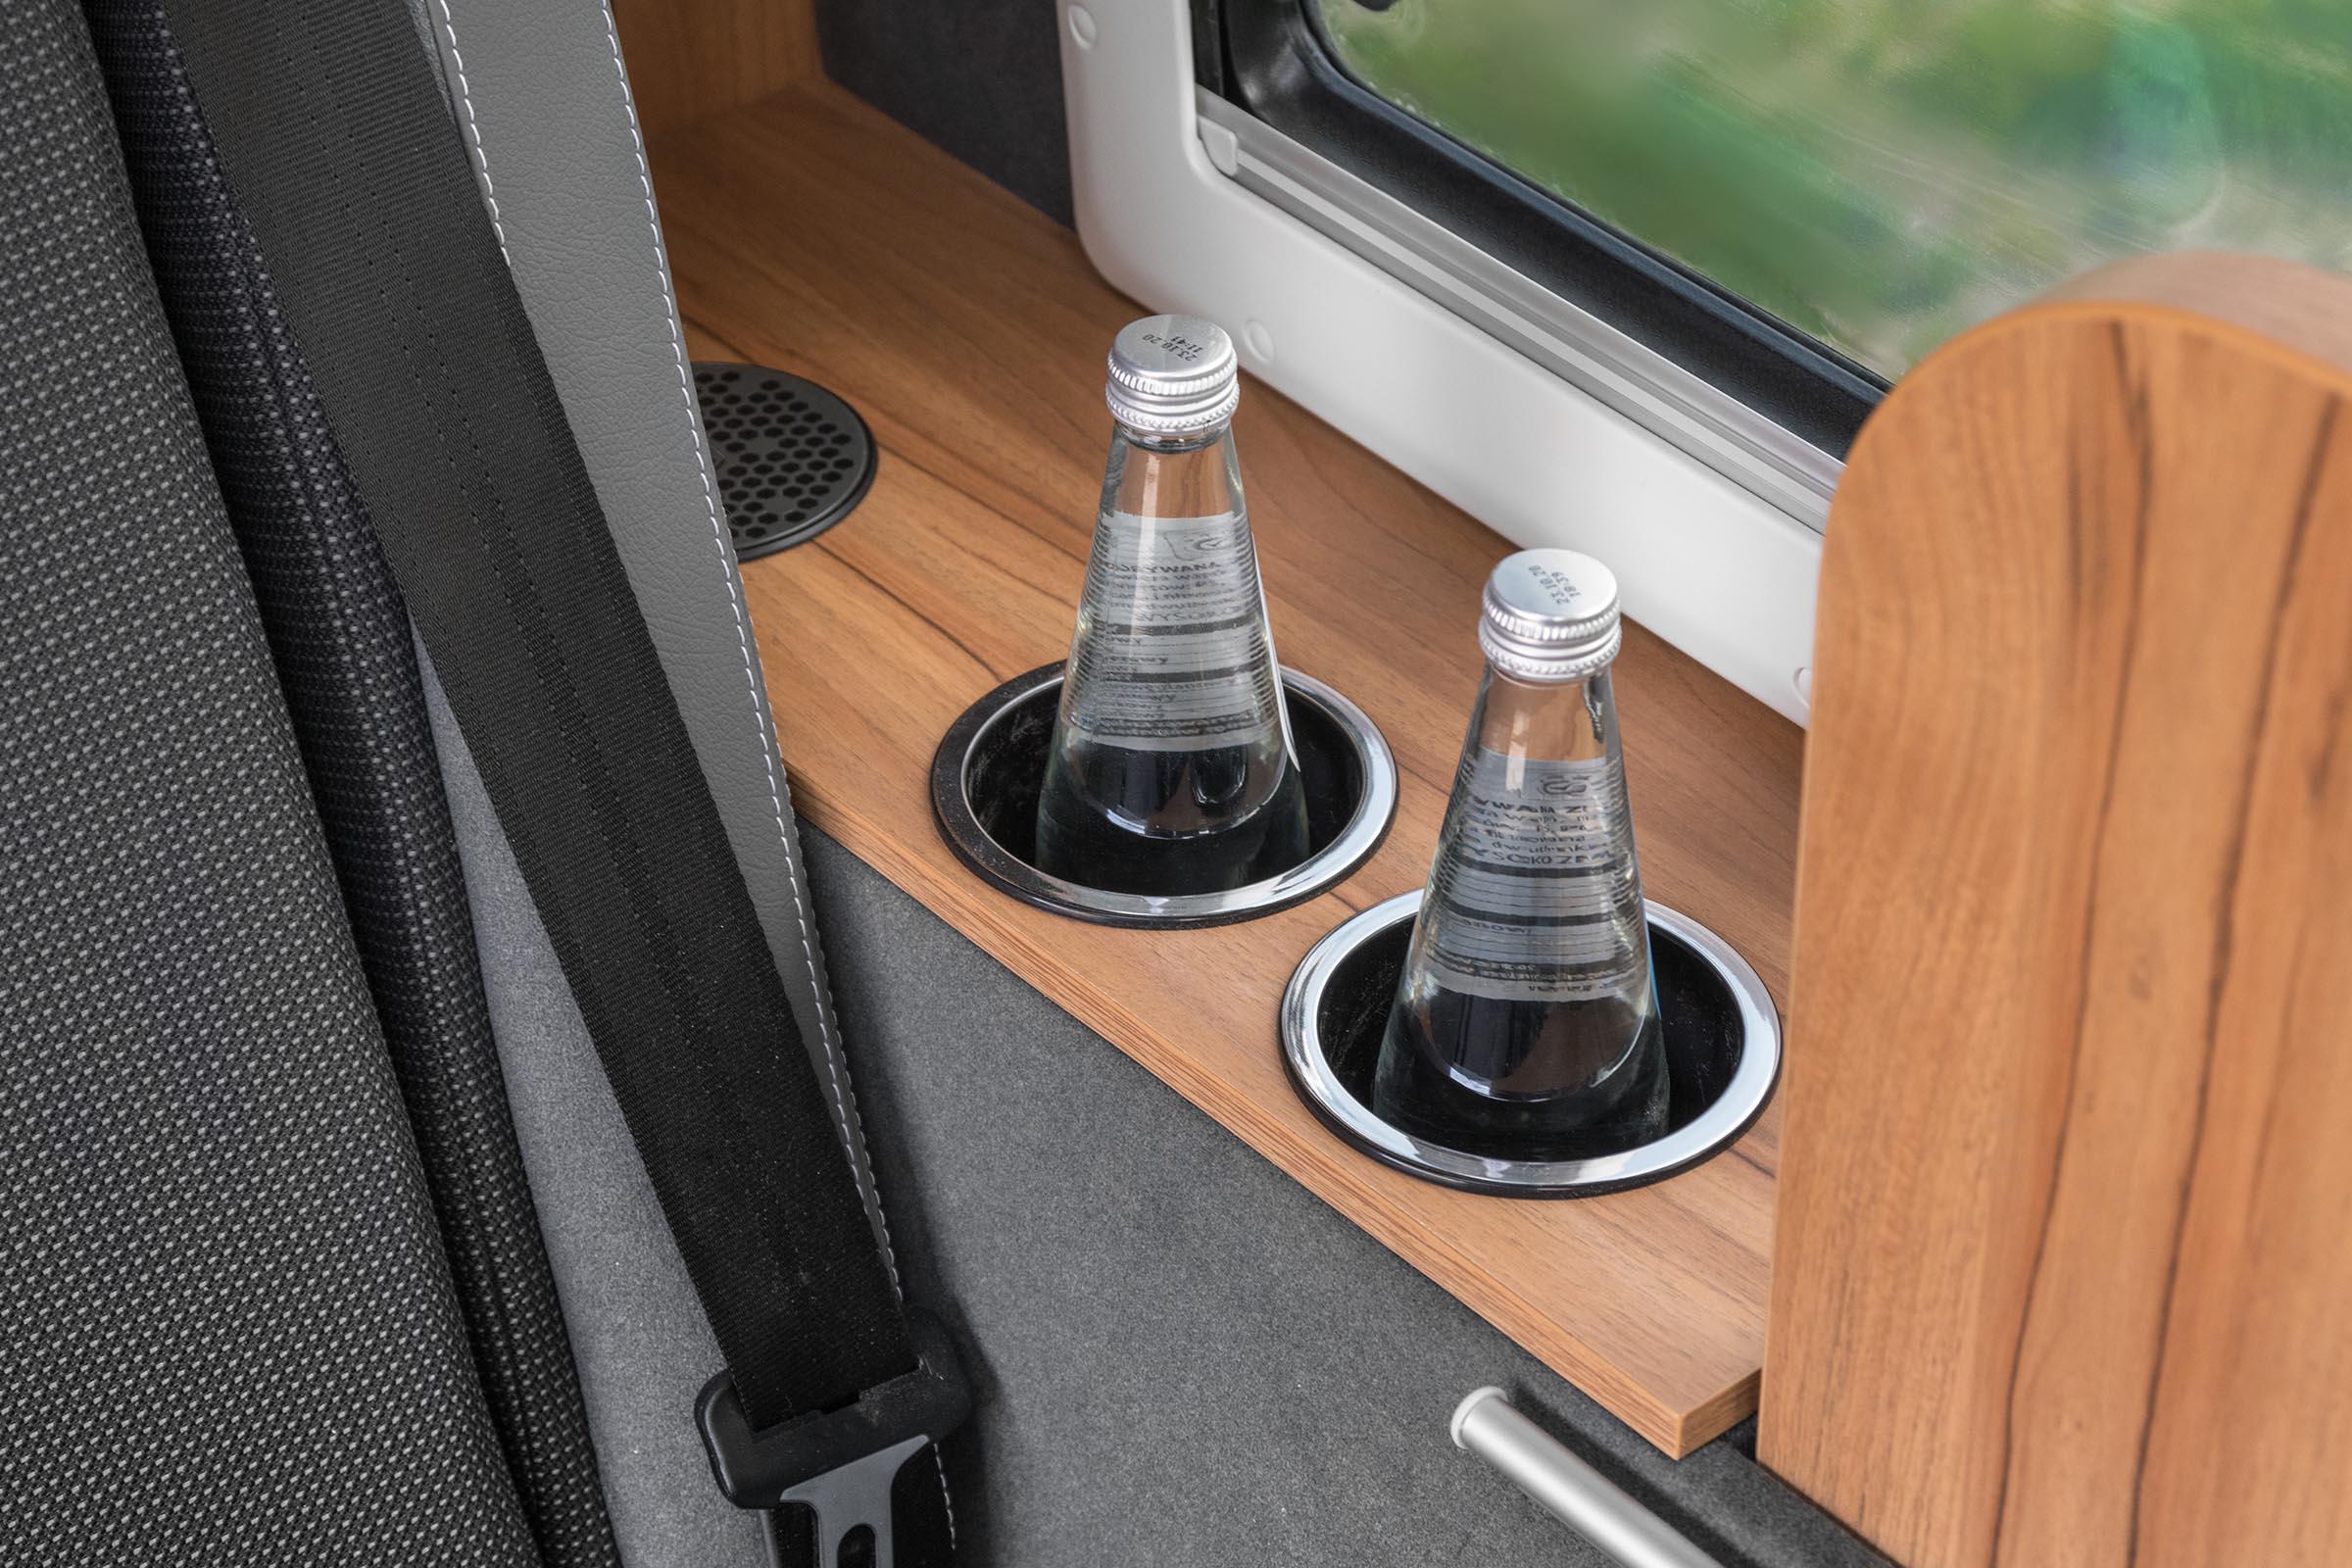 USB plugs in a camper van